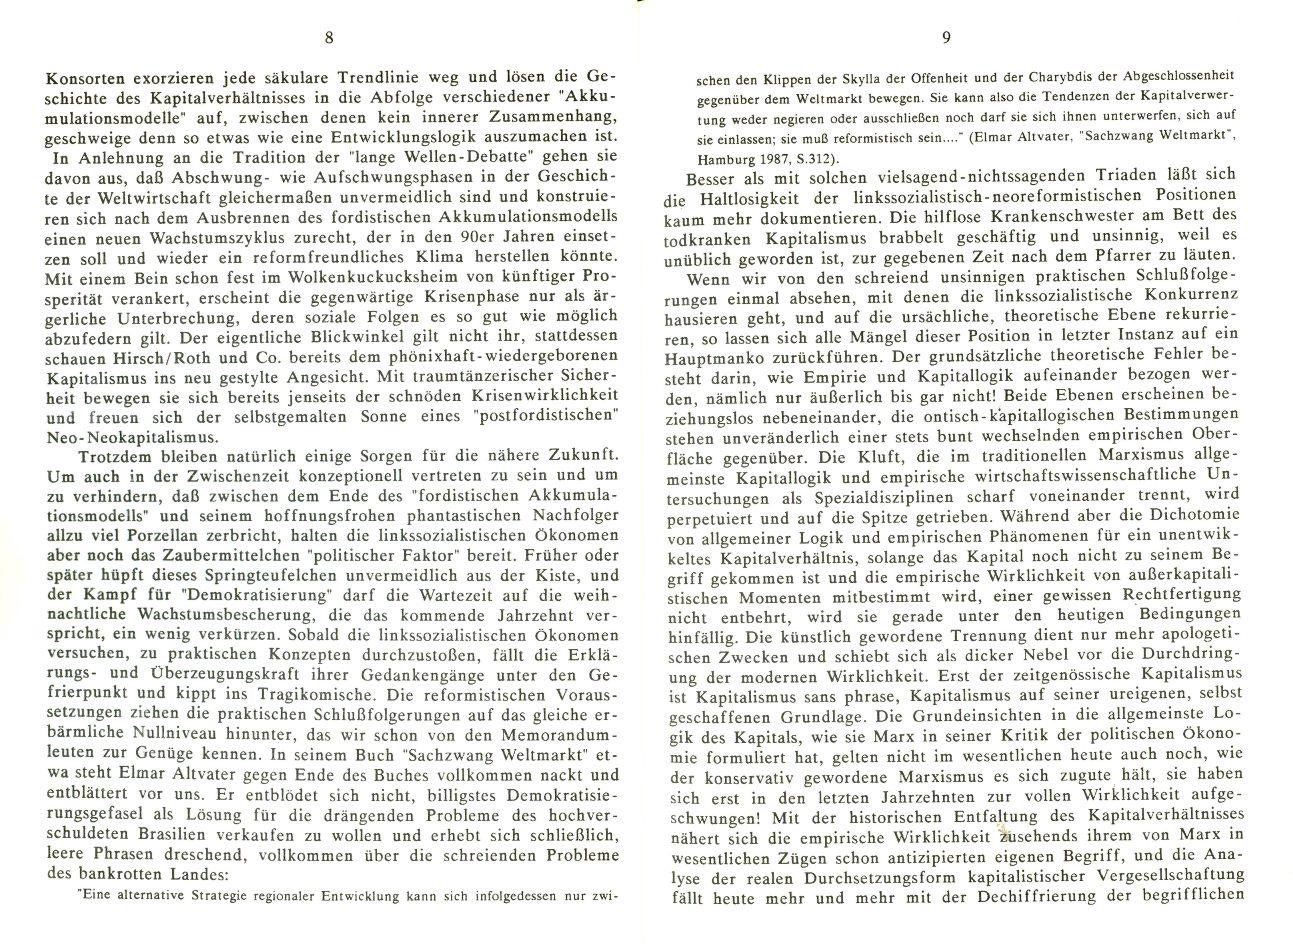 Erlangen_VMK_MK_1989_06_005